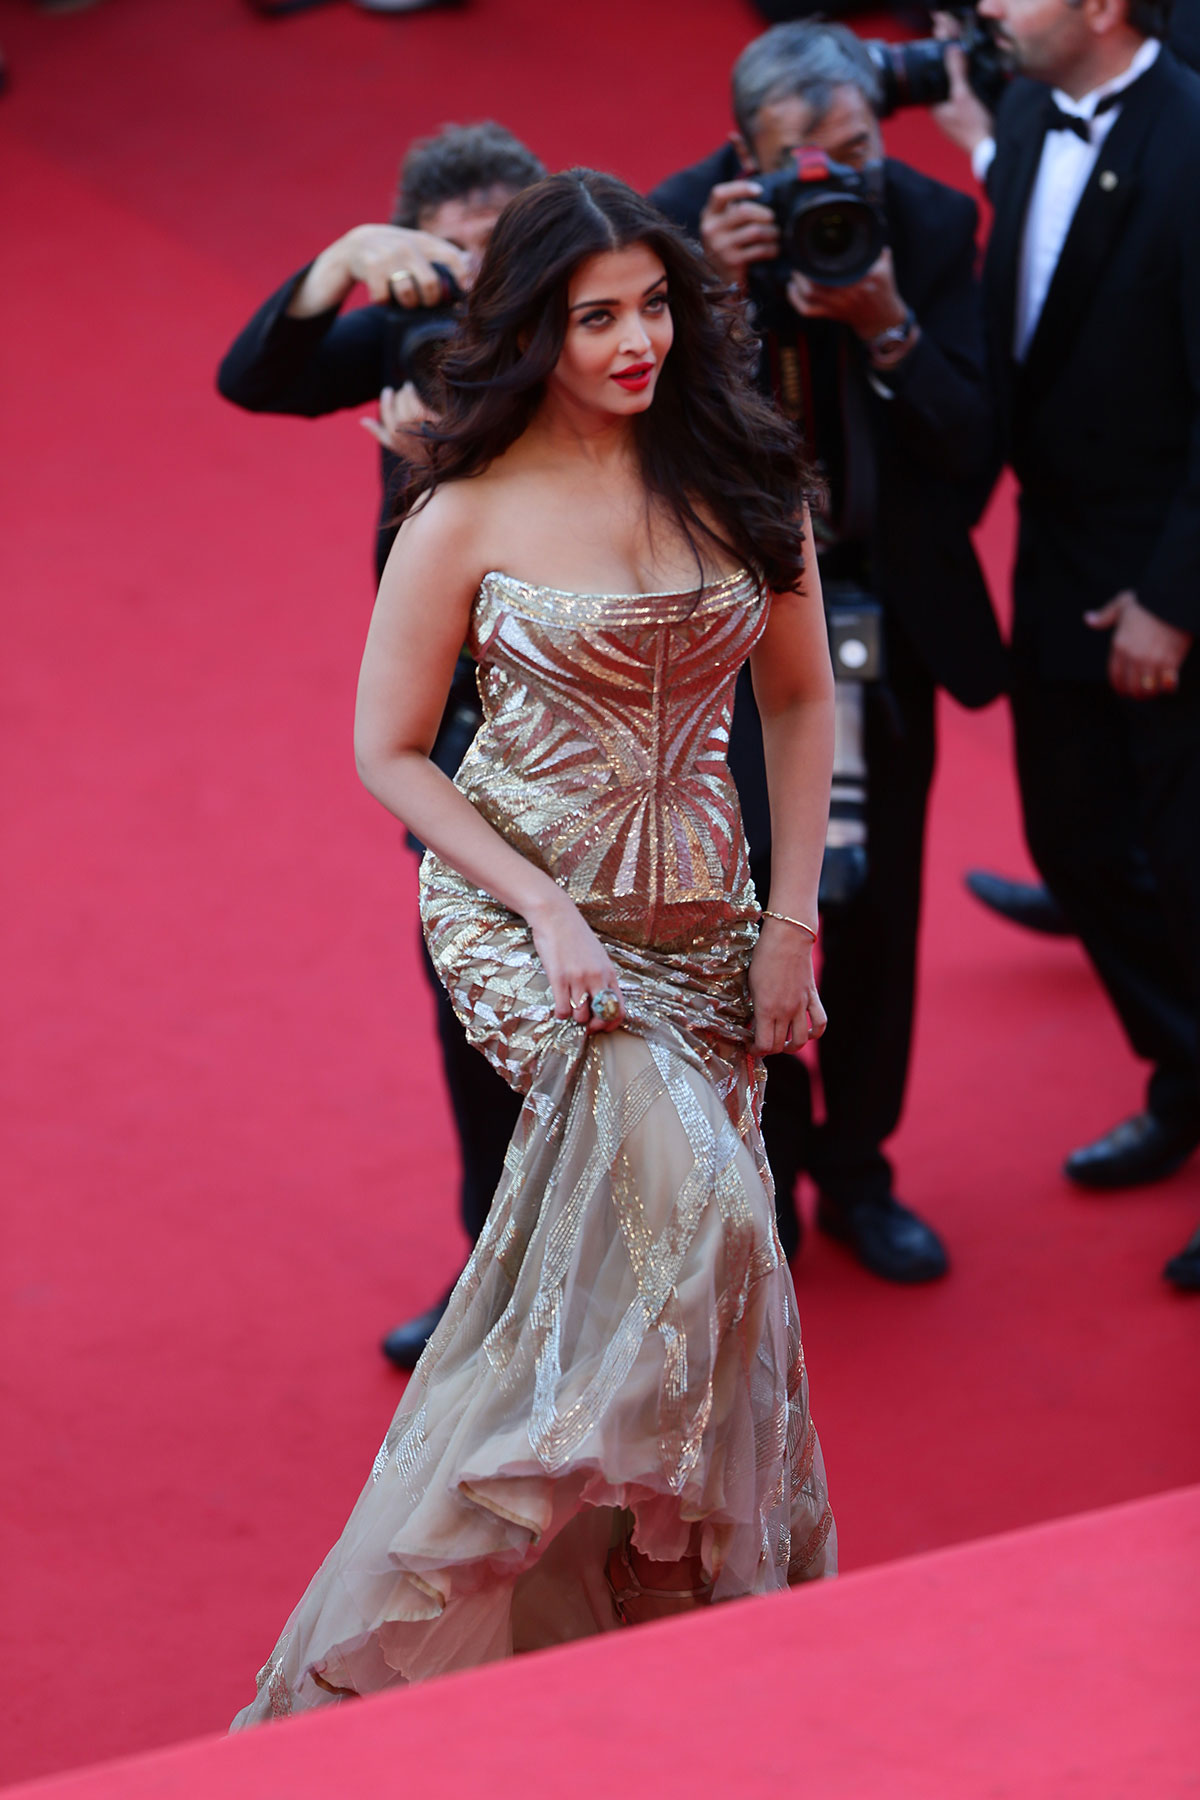 Aishwarya Rai: Latest New look HD Hot and Sexy Photo Gallery |Aishwarya Rai 2014 March